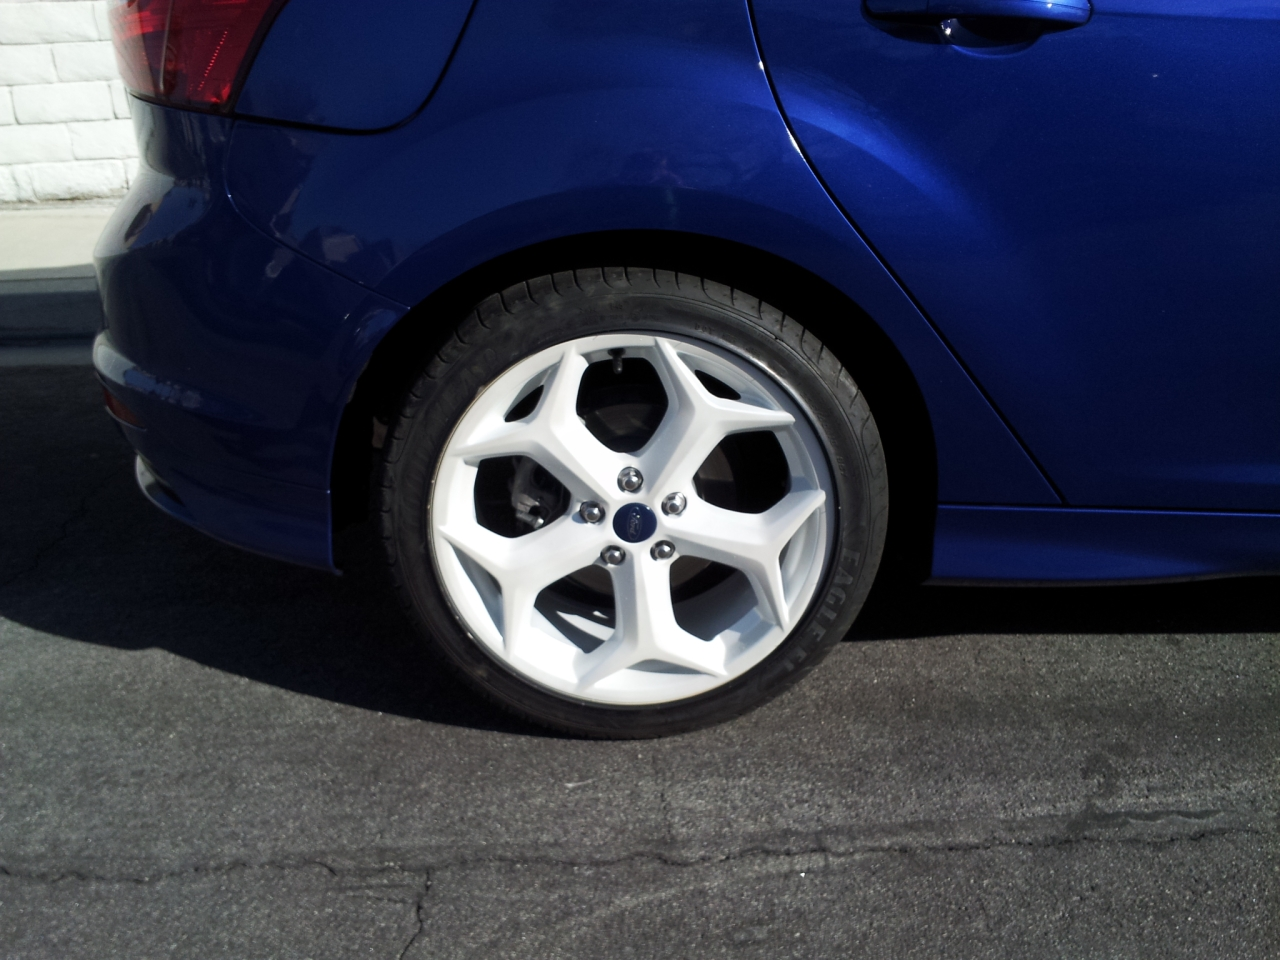 Plastidip My Wheels Tomorrow